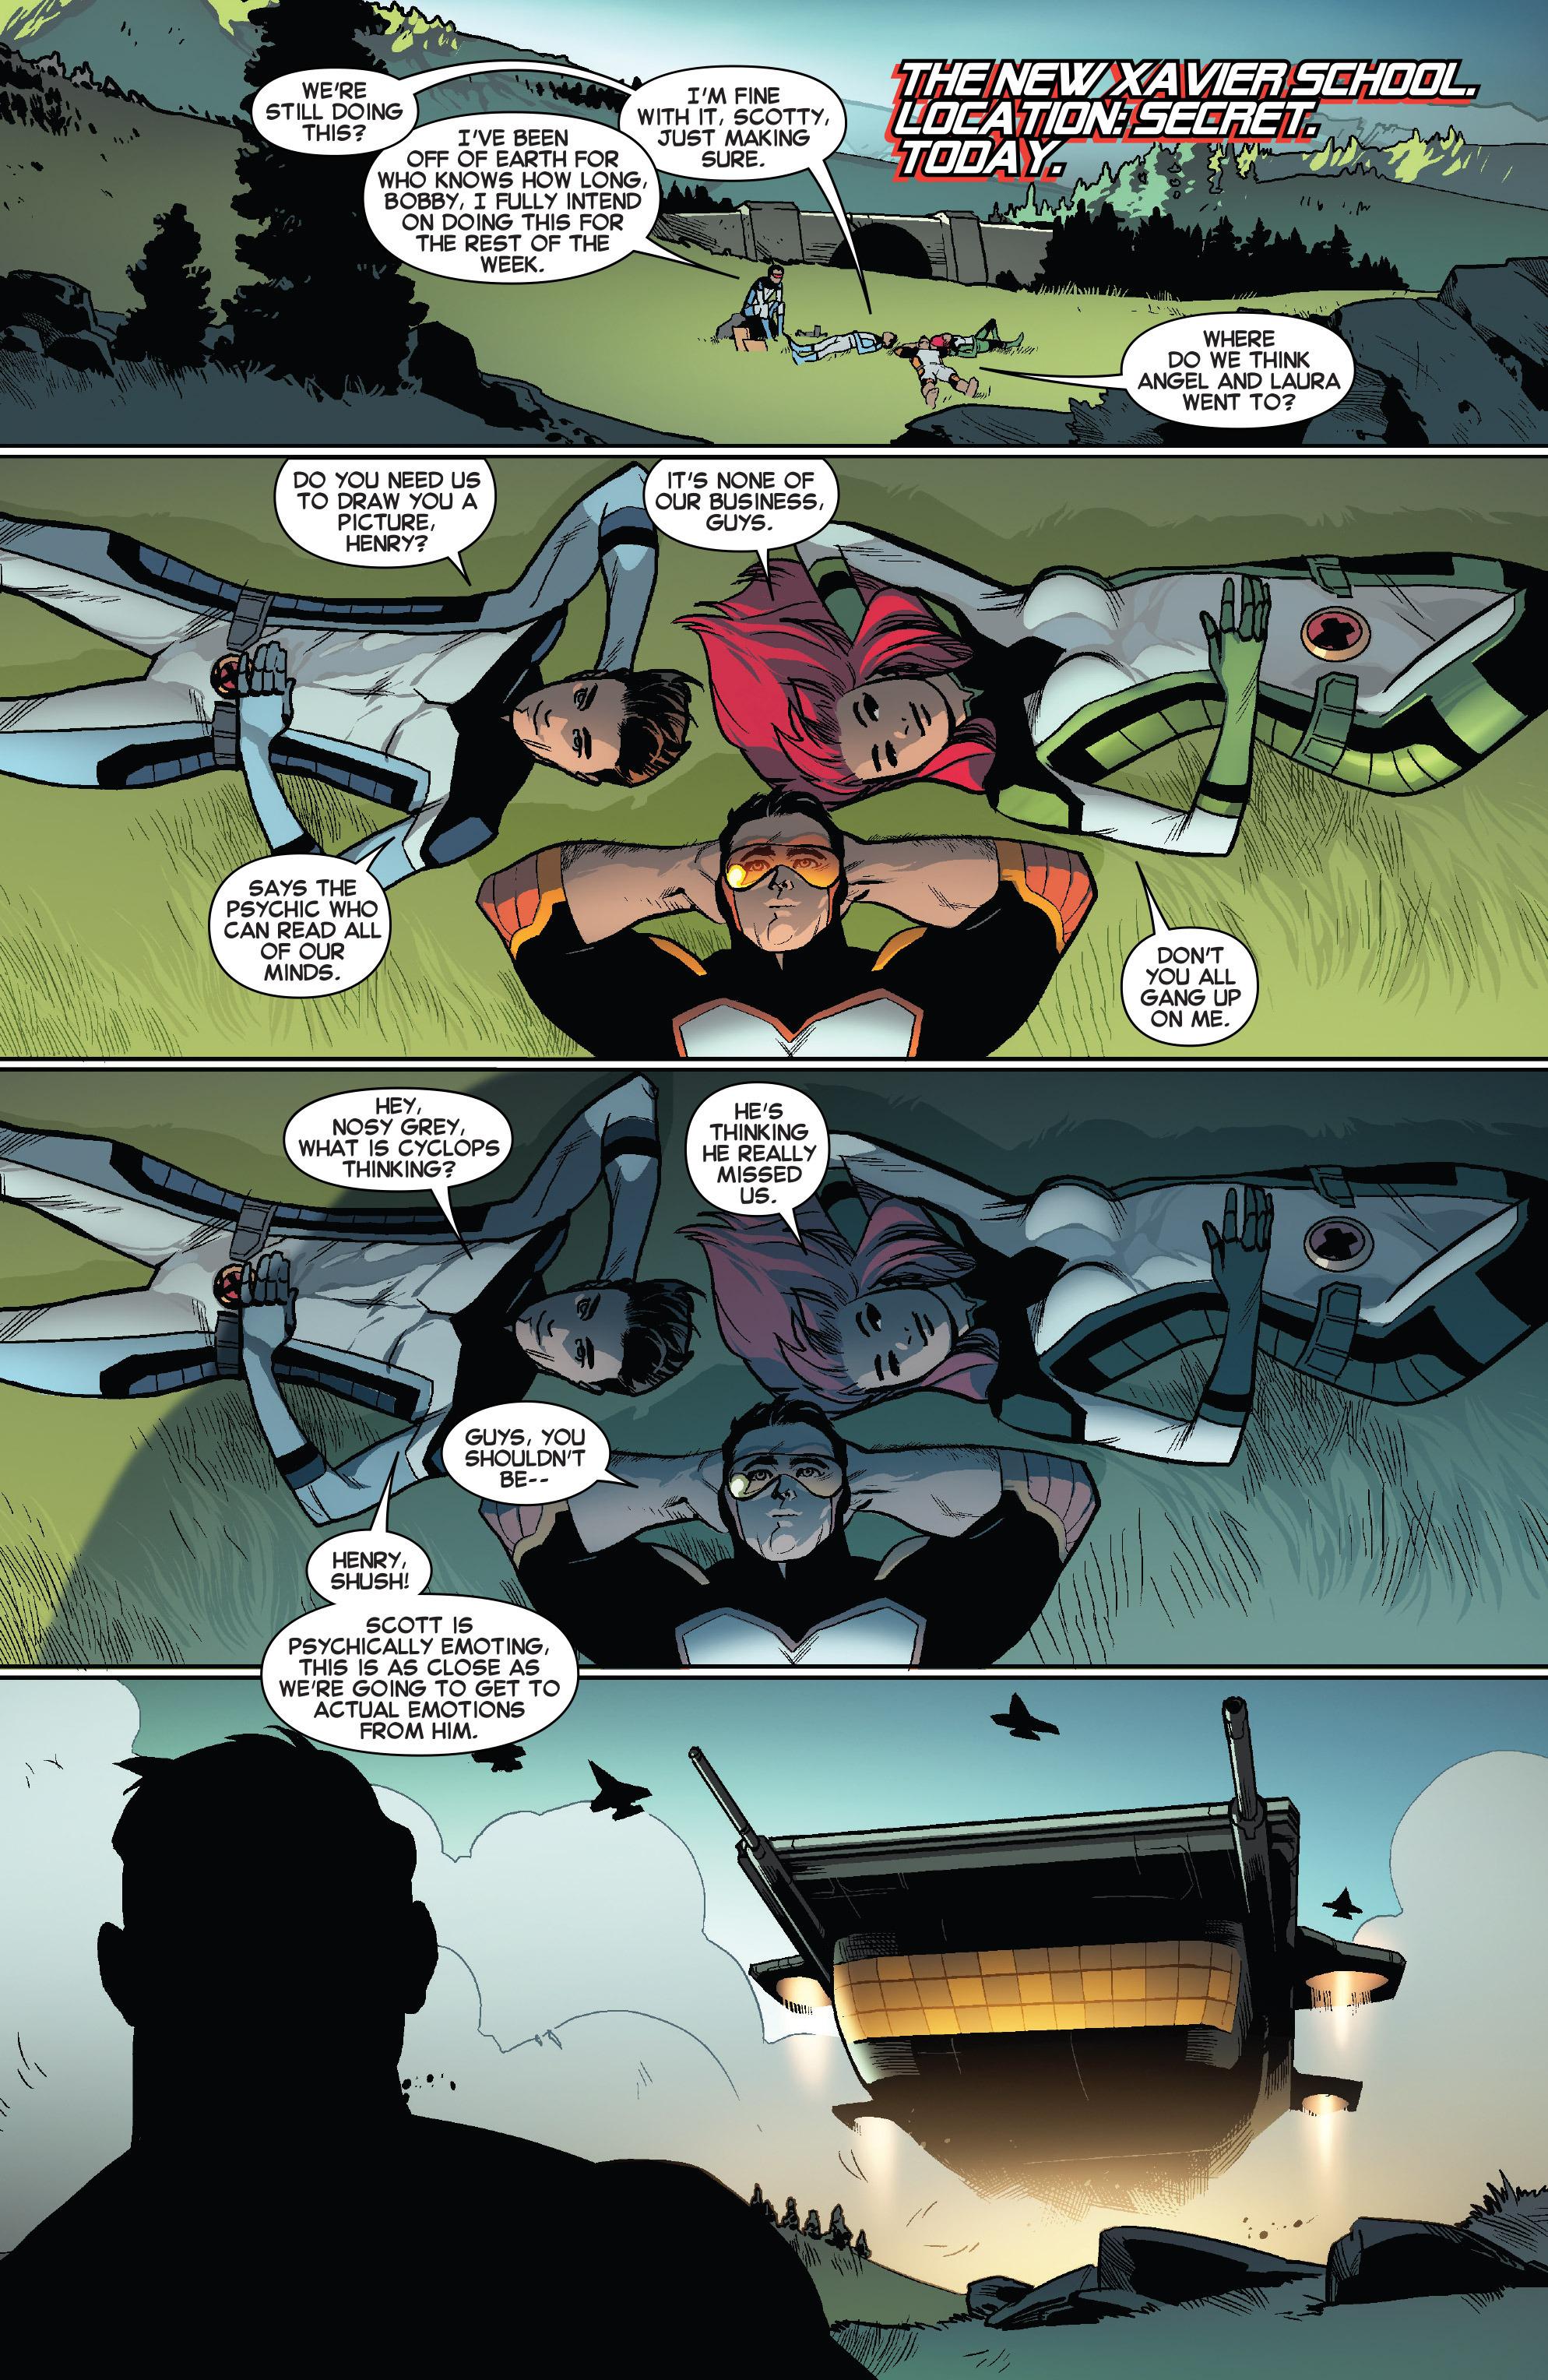 All-New X-Men (2013) chap 41 pic 3